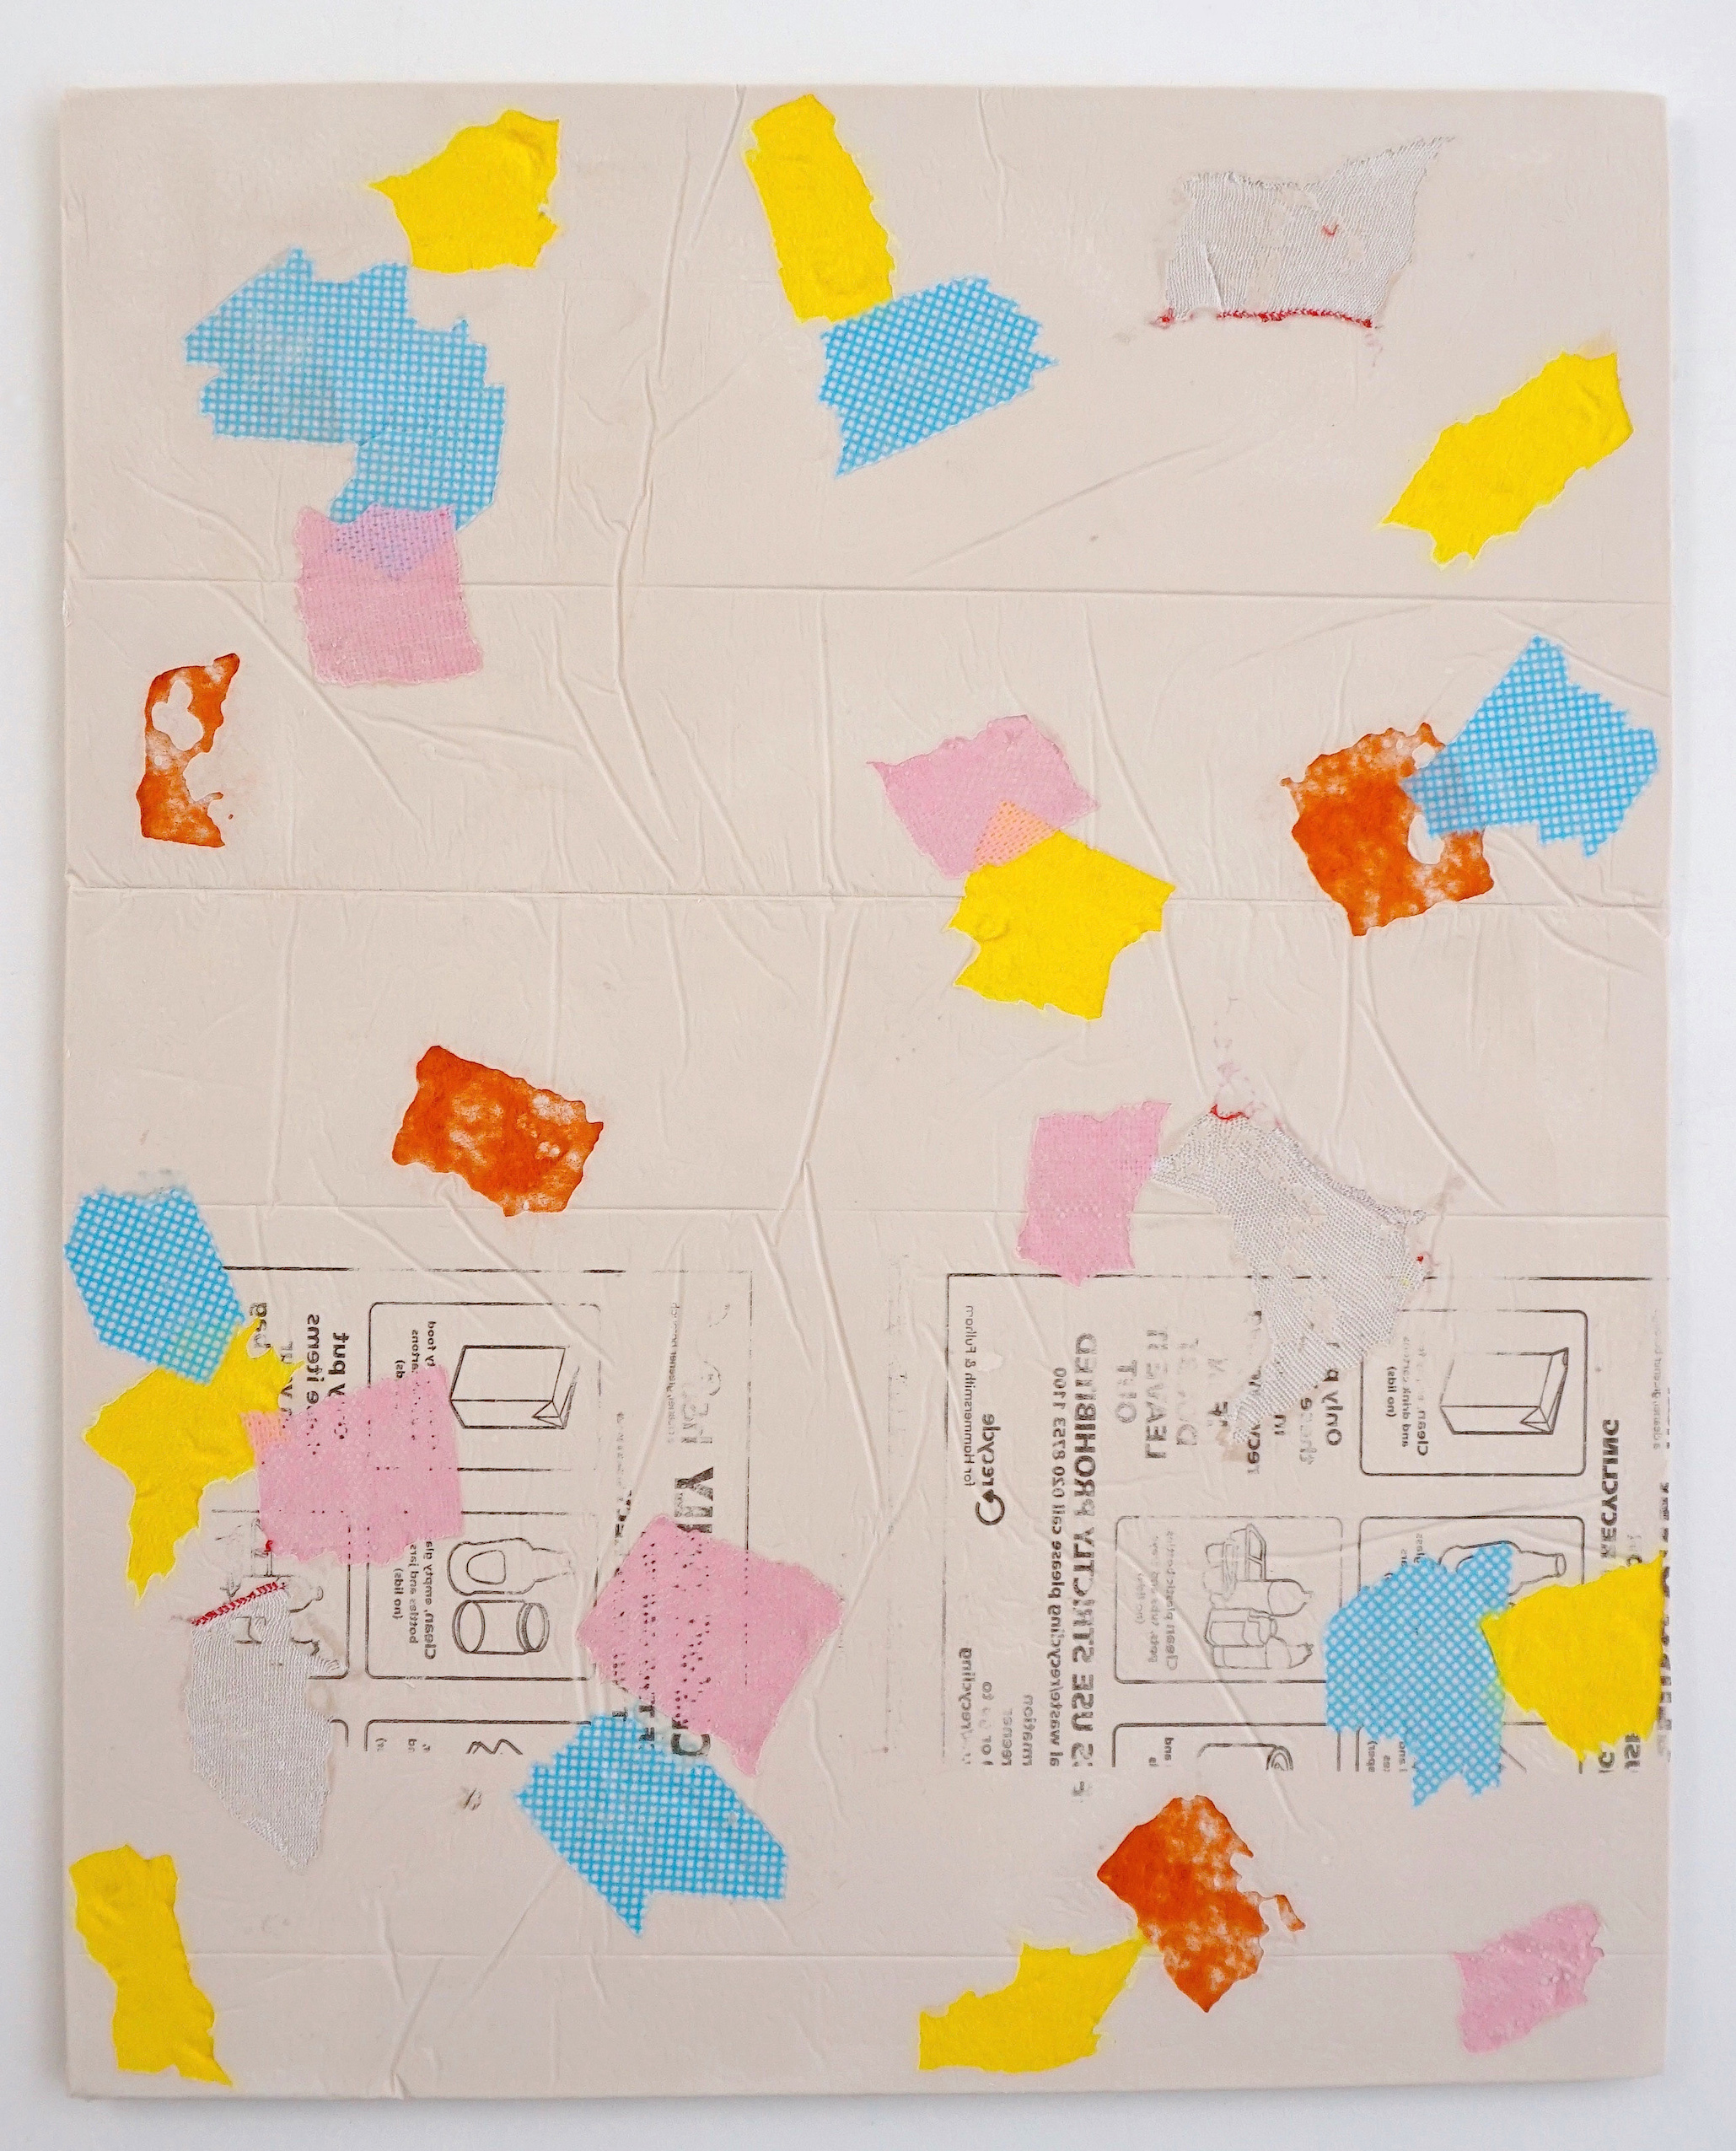 Domestic Bliss (yellow, blue, orange) | Composite, Mixed Media | 100 x 80 cm